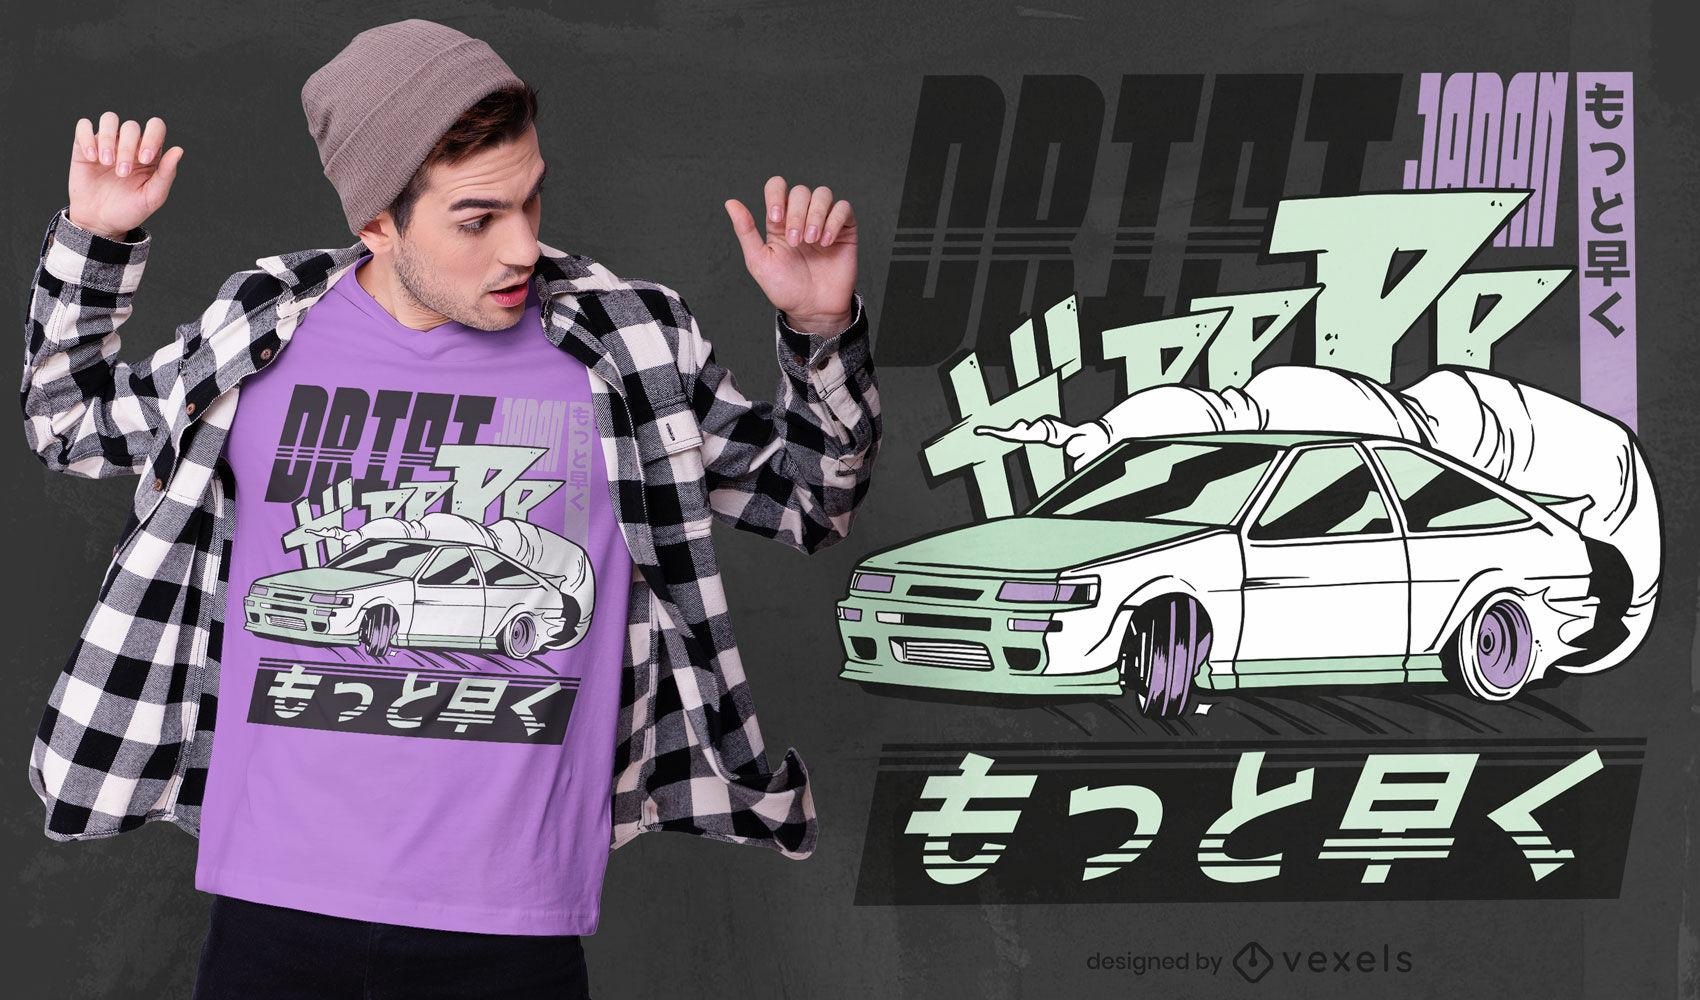 Diseño de camiseta de coche japonés a la deriva.